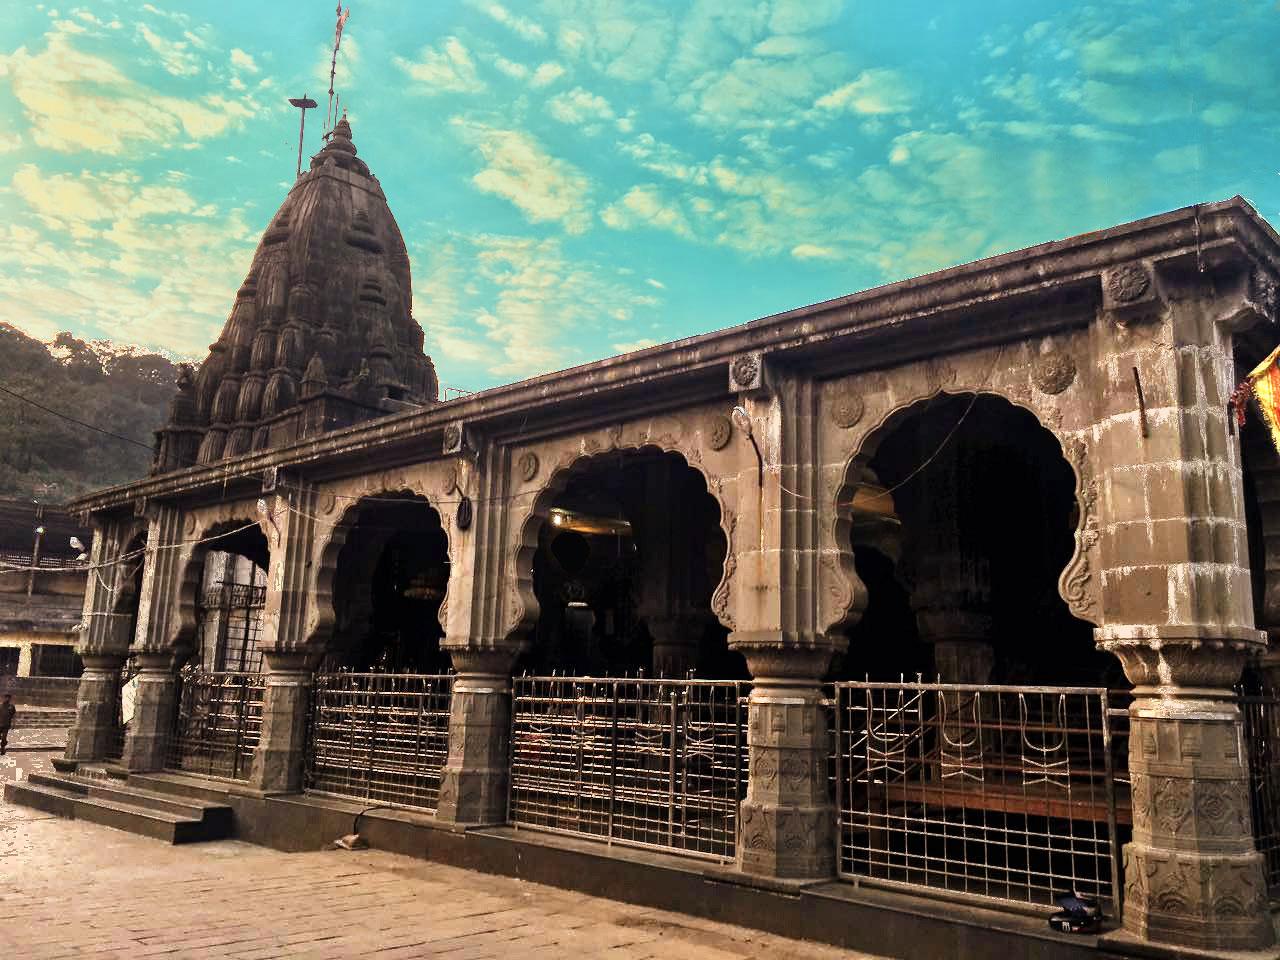 Shri Bhimashankar temple - The sixth of the 12 divine Jyotirlingas of Lord Shiva.